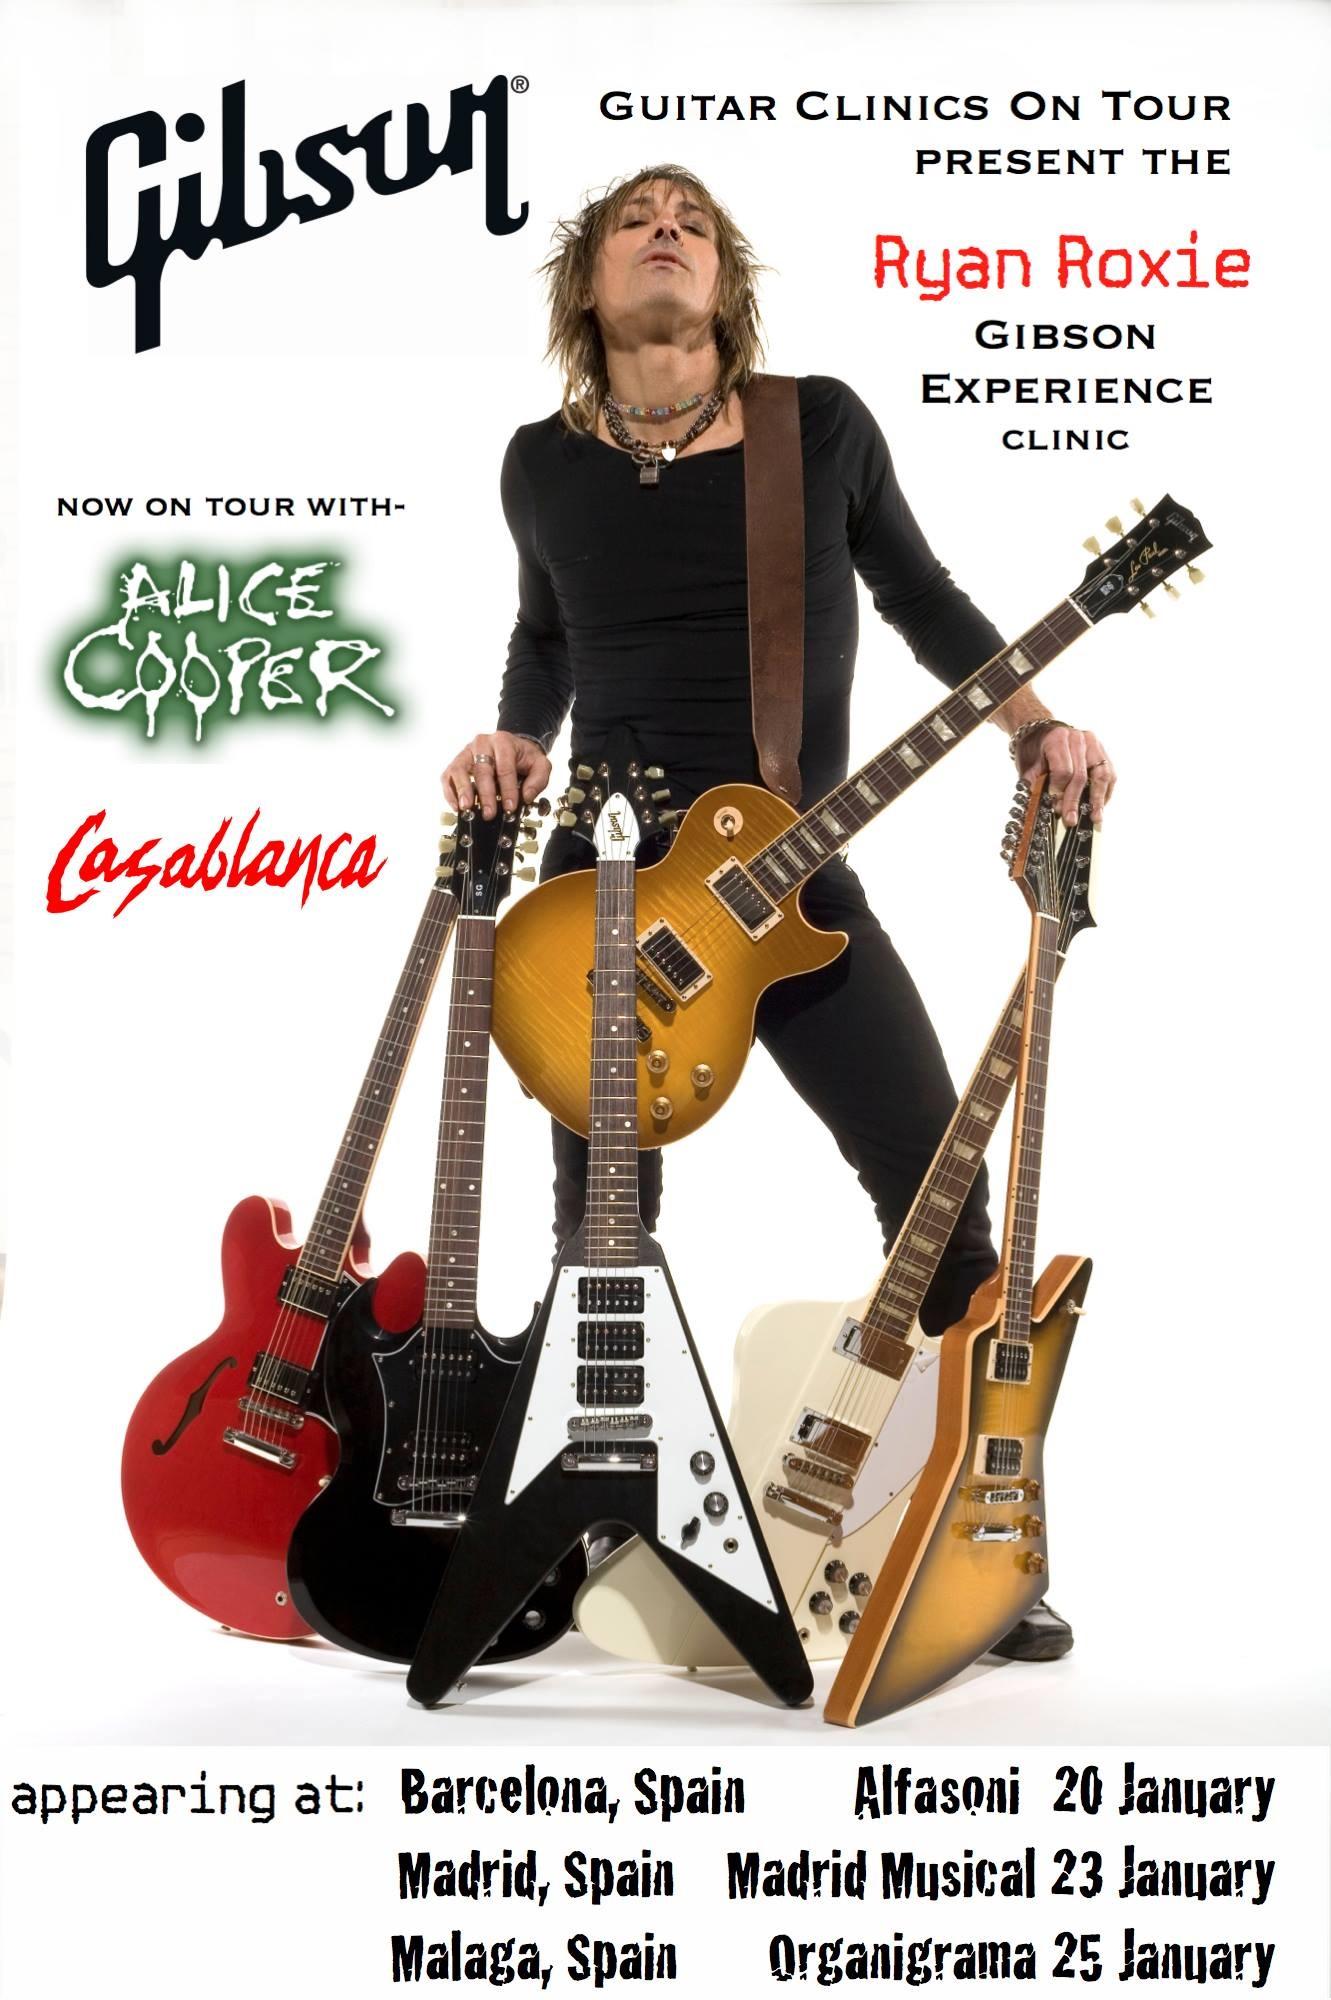 Ryan Roxie Guitar Clinics